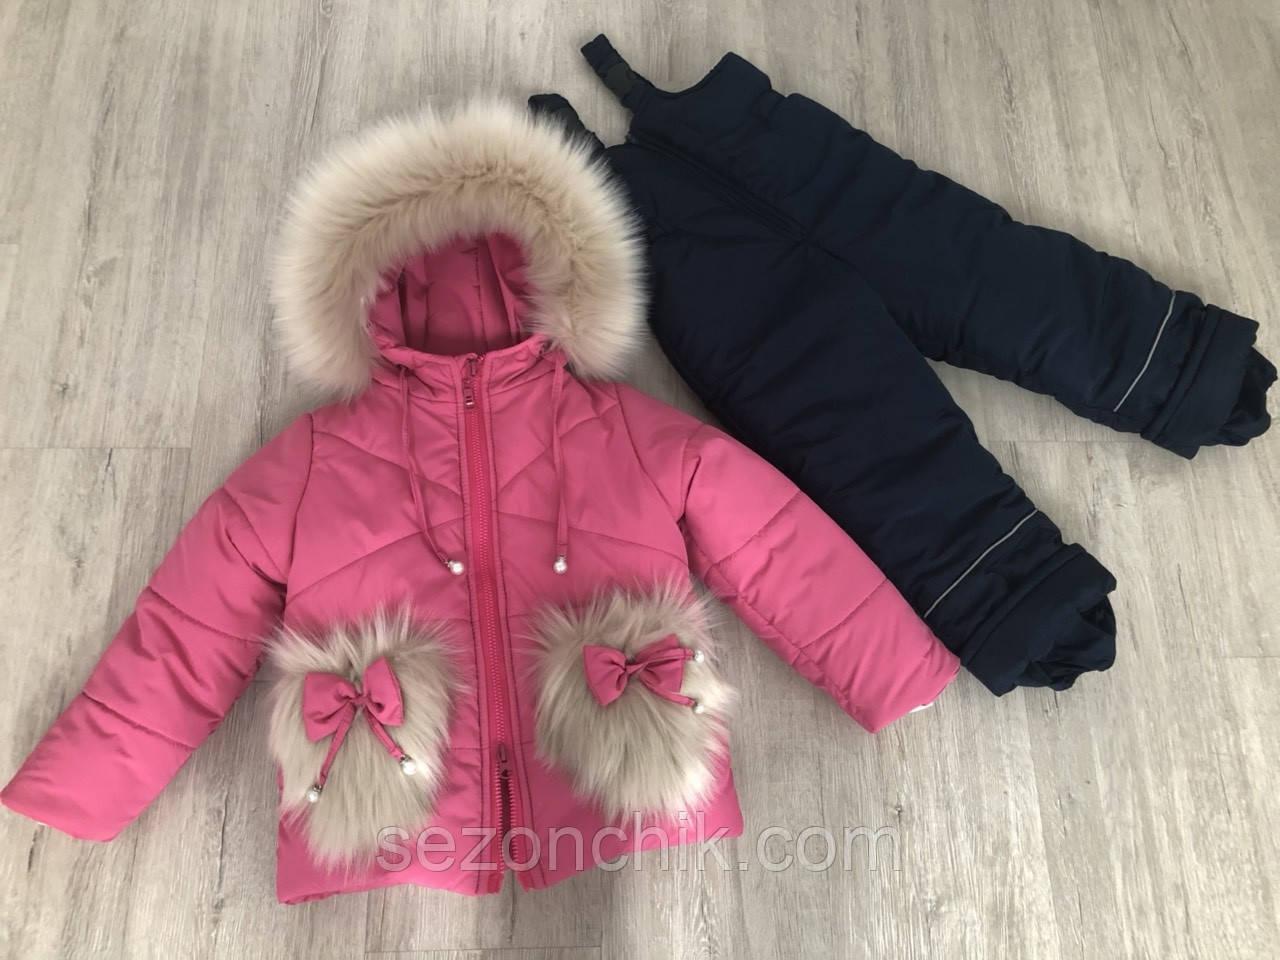 Яркий зимний детский костюм на девочек